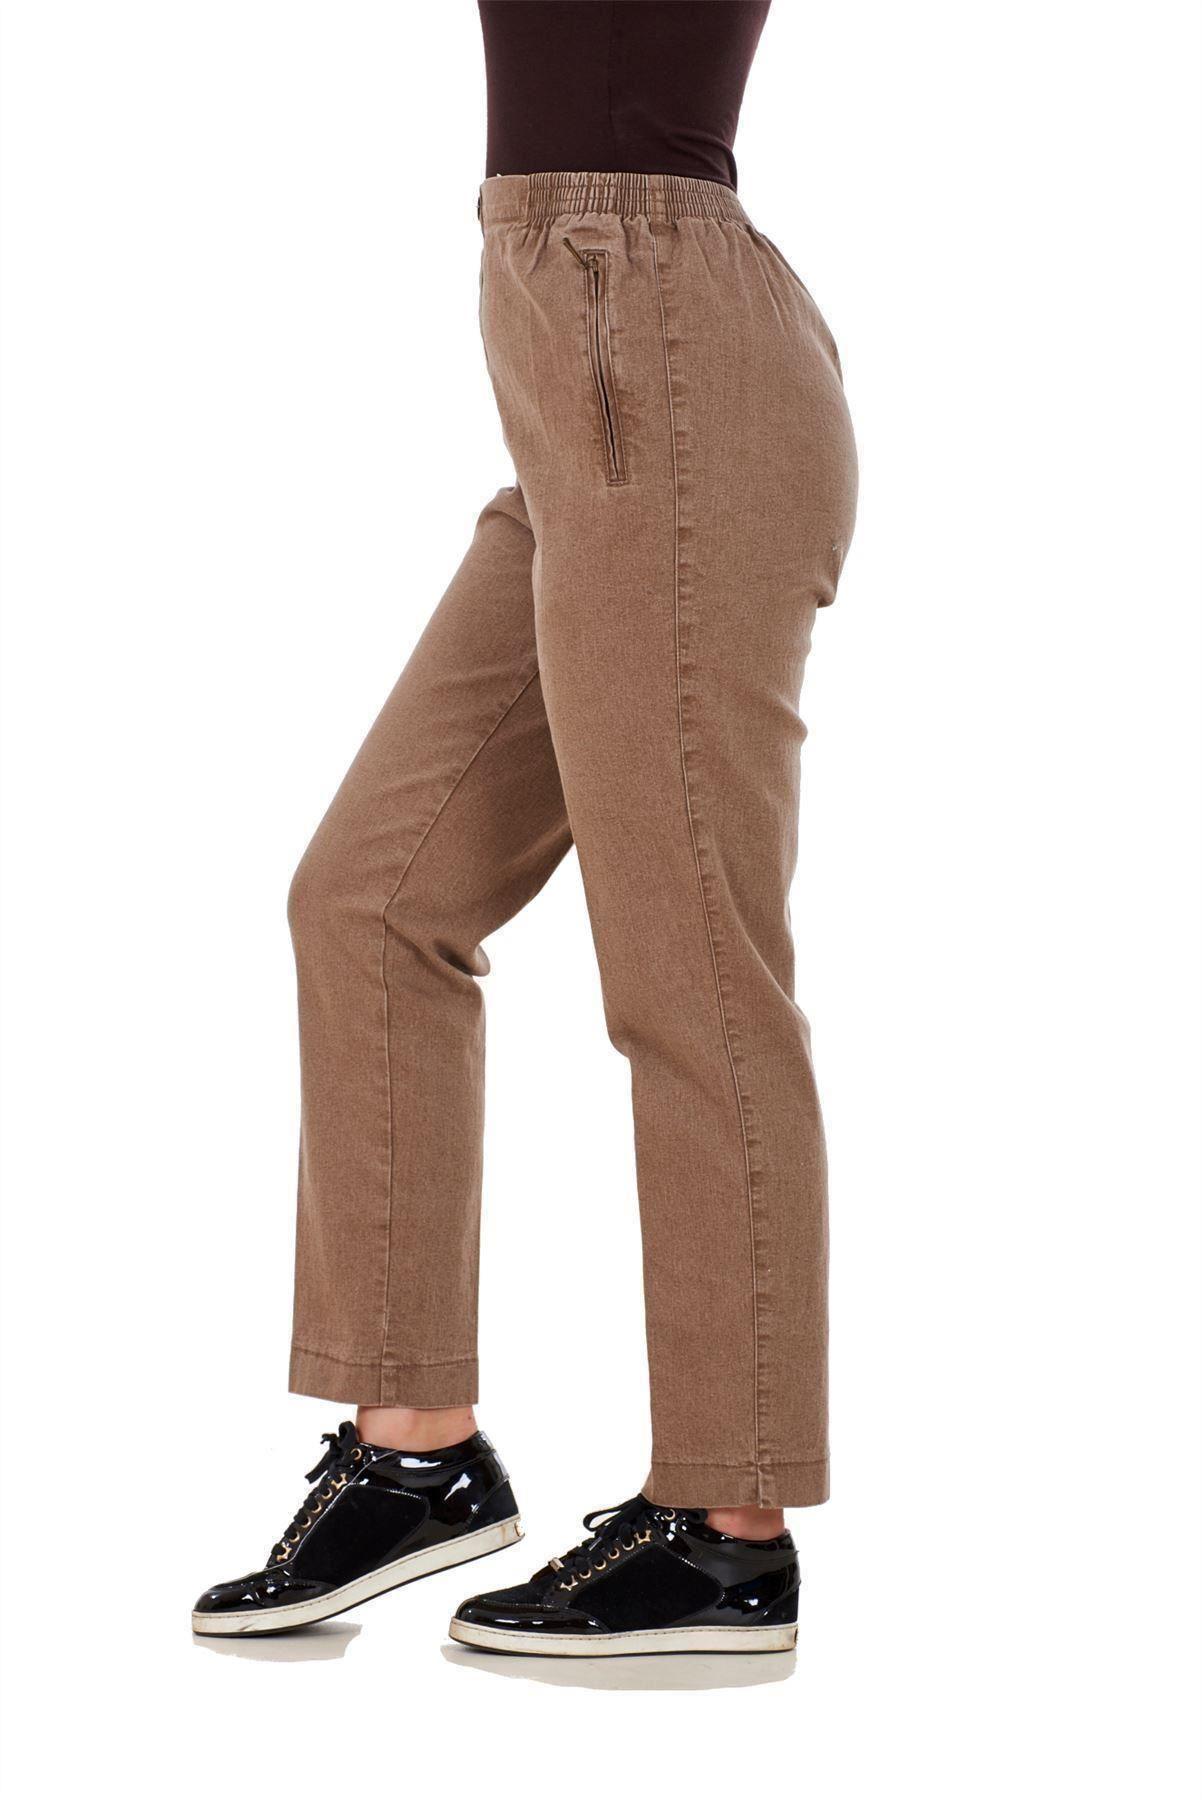 Ladies-Women-Trousers-Rayon-Cotton-Pockets-Elasticated-Stretch-Black-pants-8-24 thumbnail 3